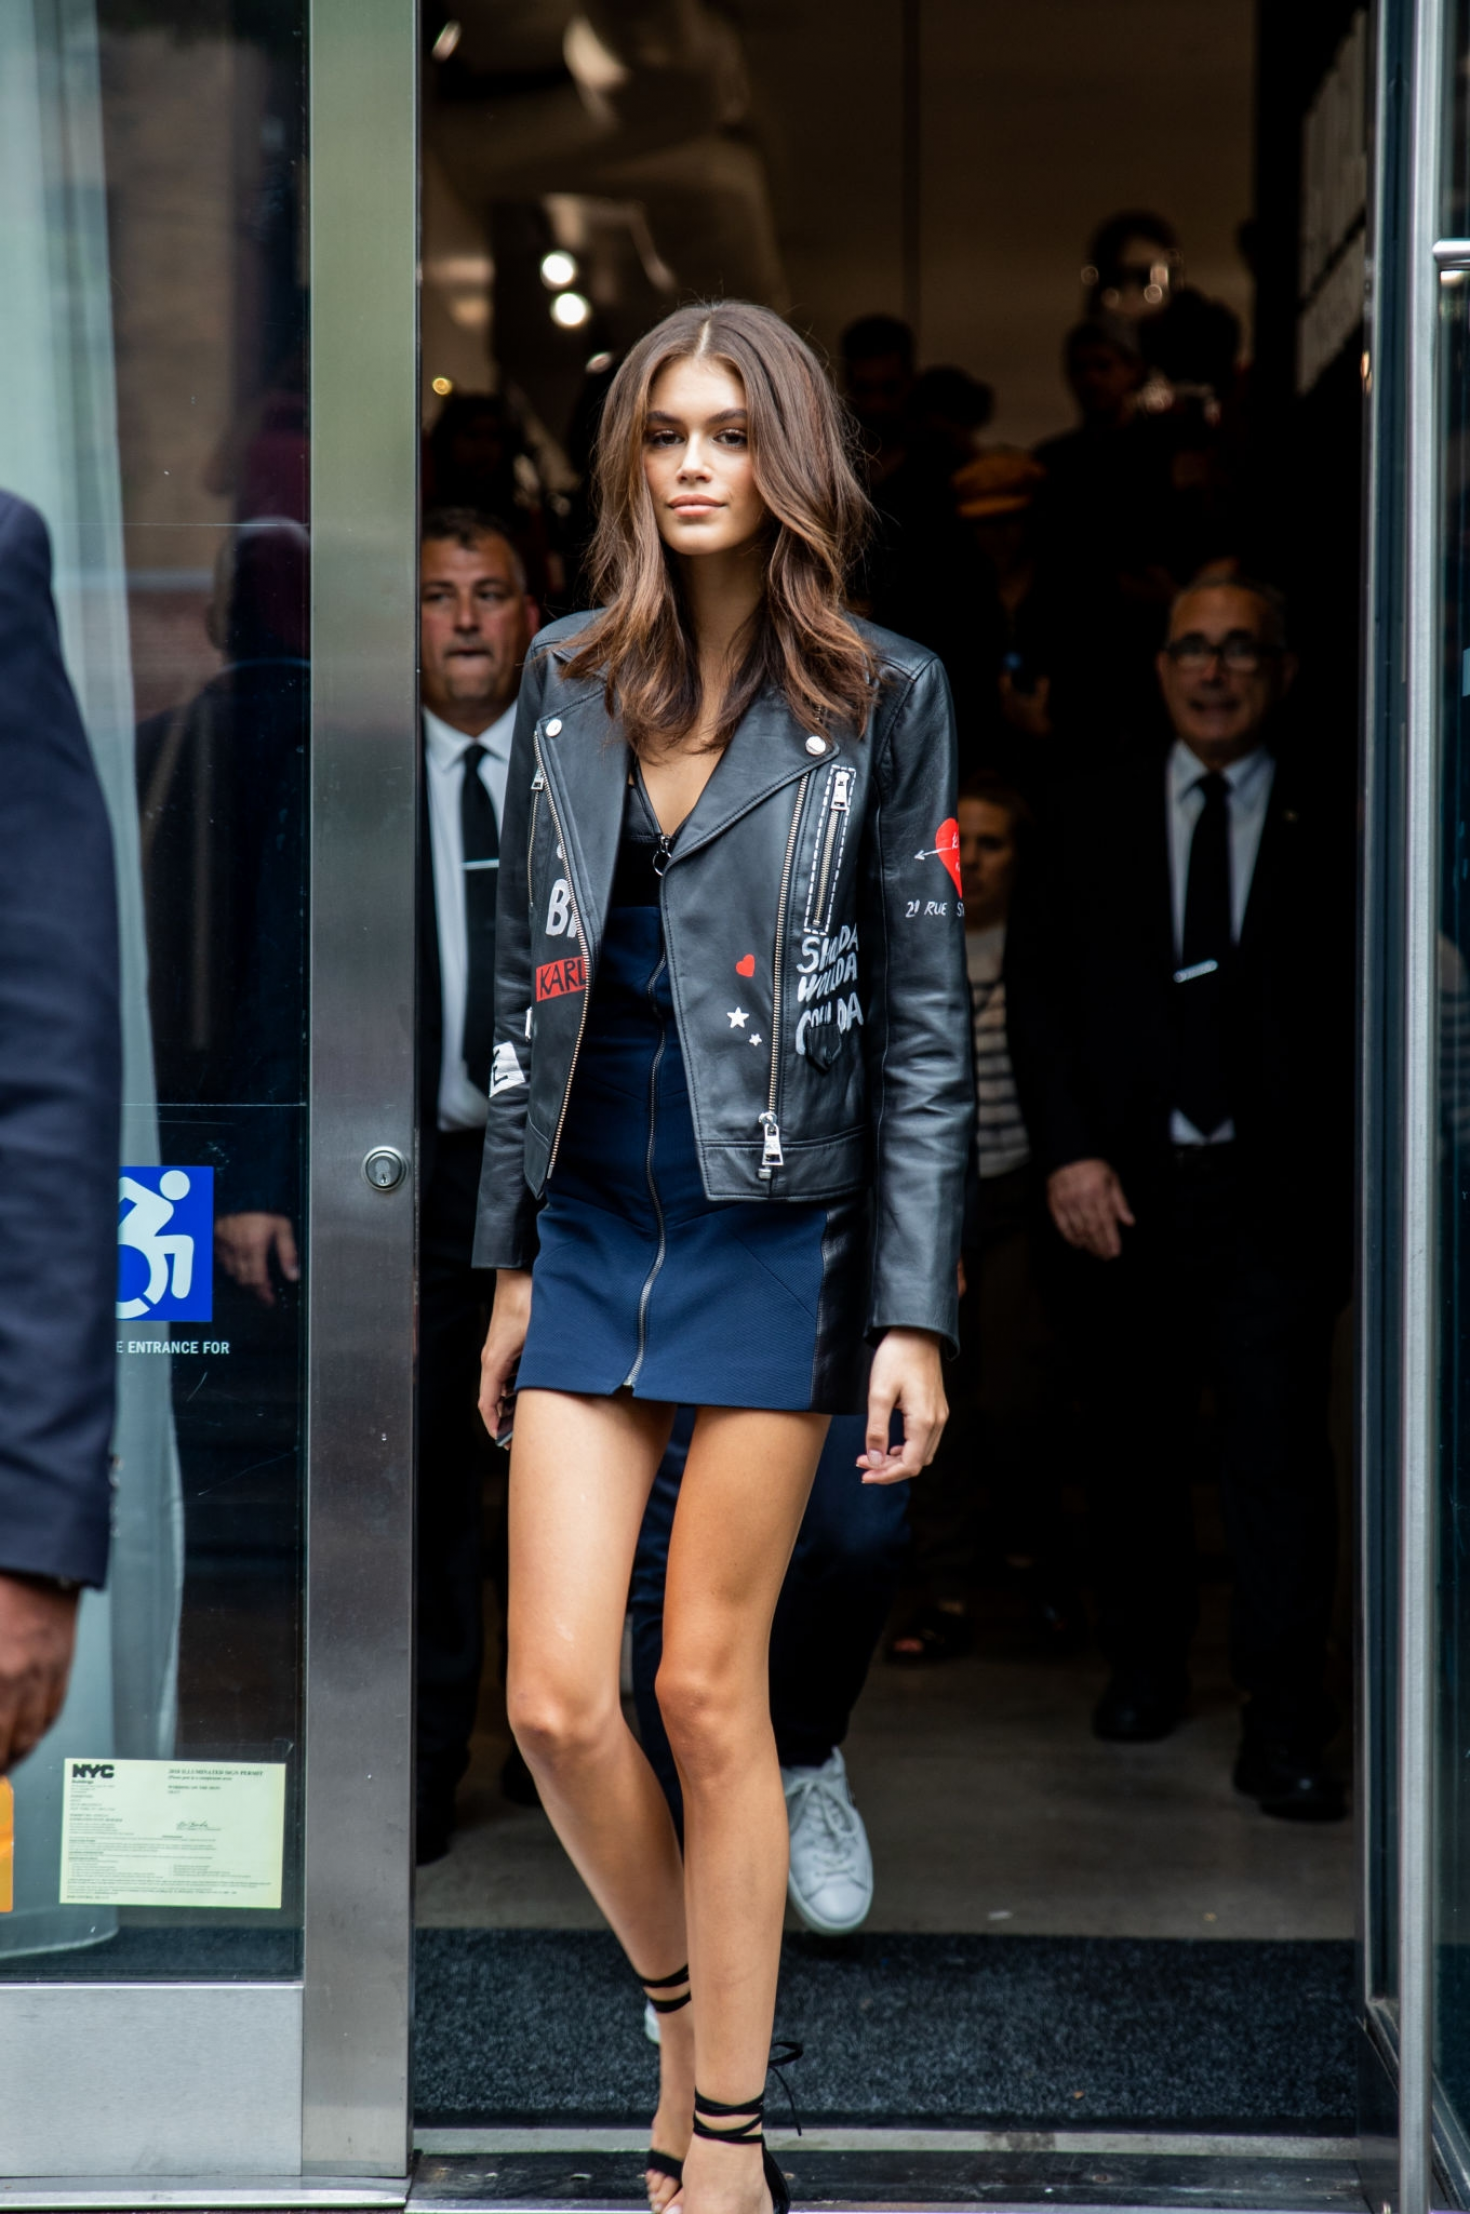 Kaia Gerber at New York Fashion Week in NYC